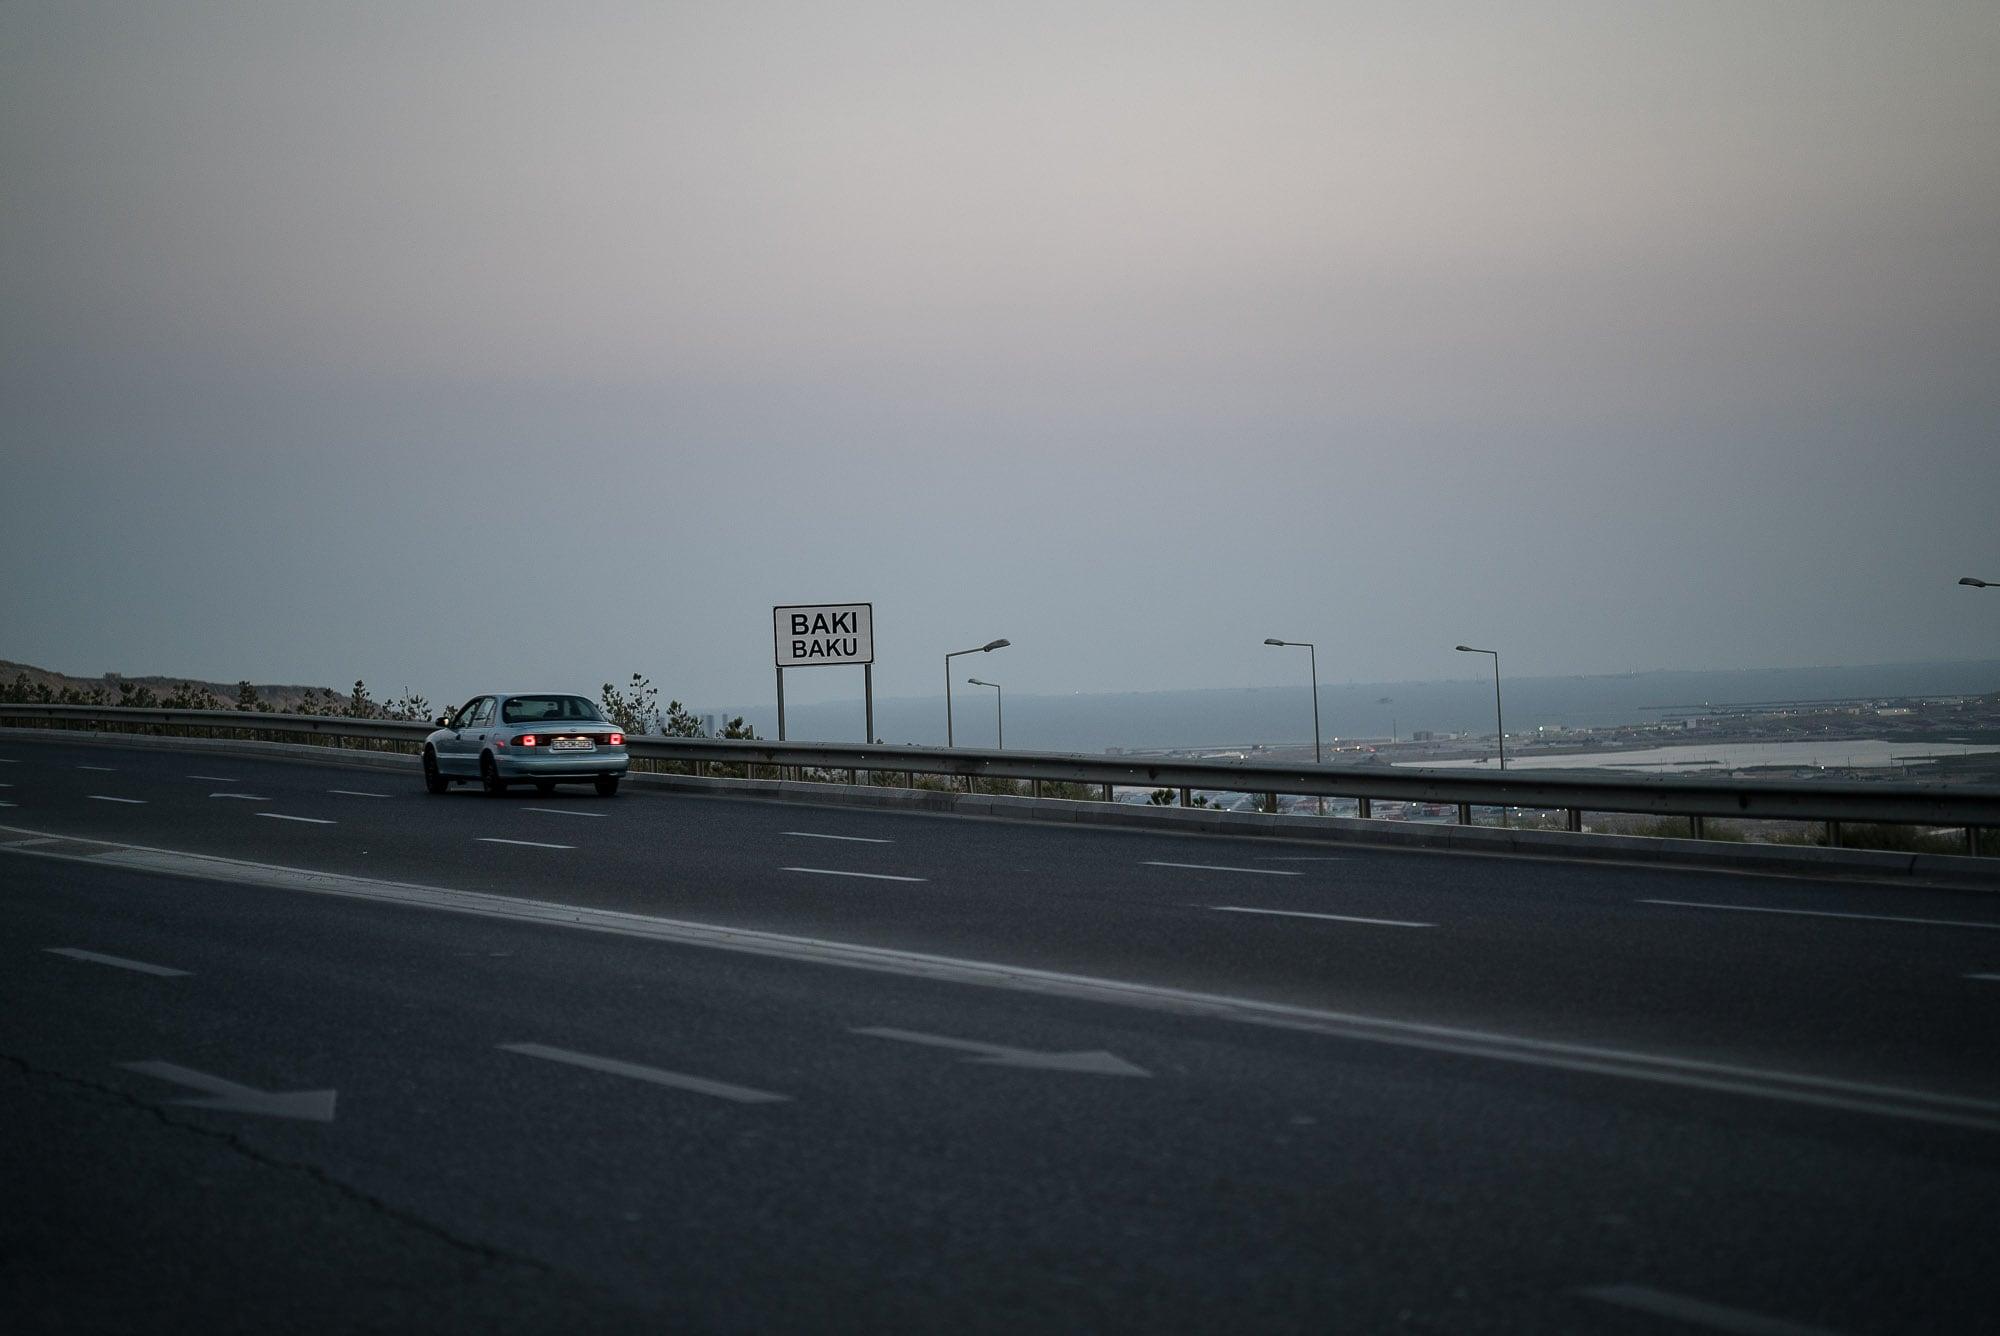 Baku city limits